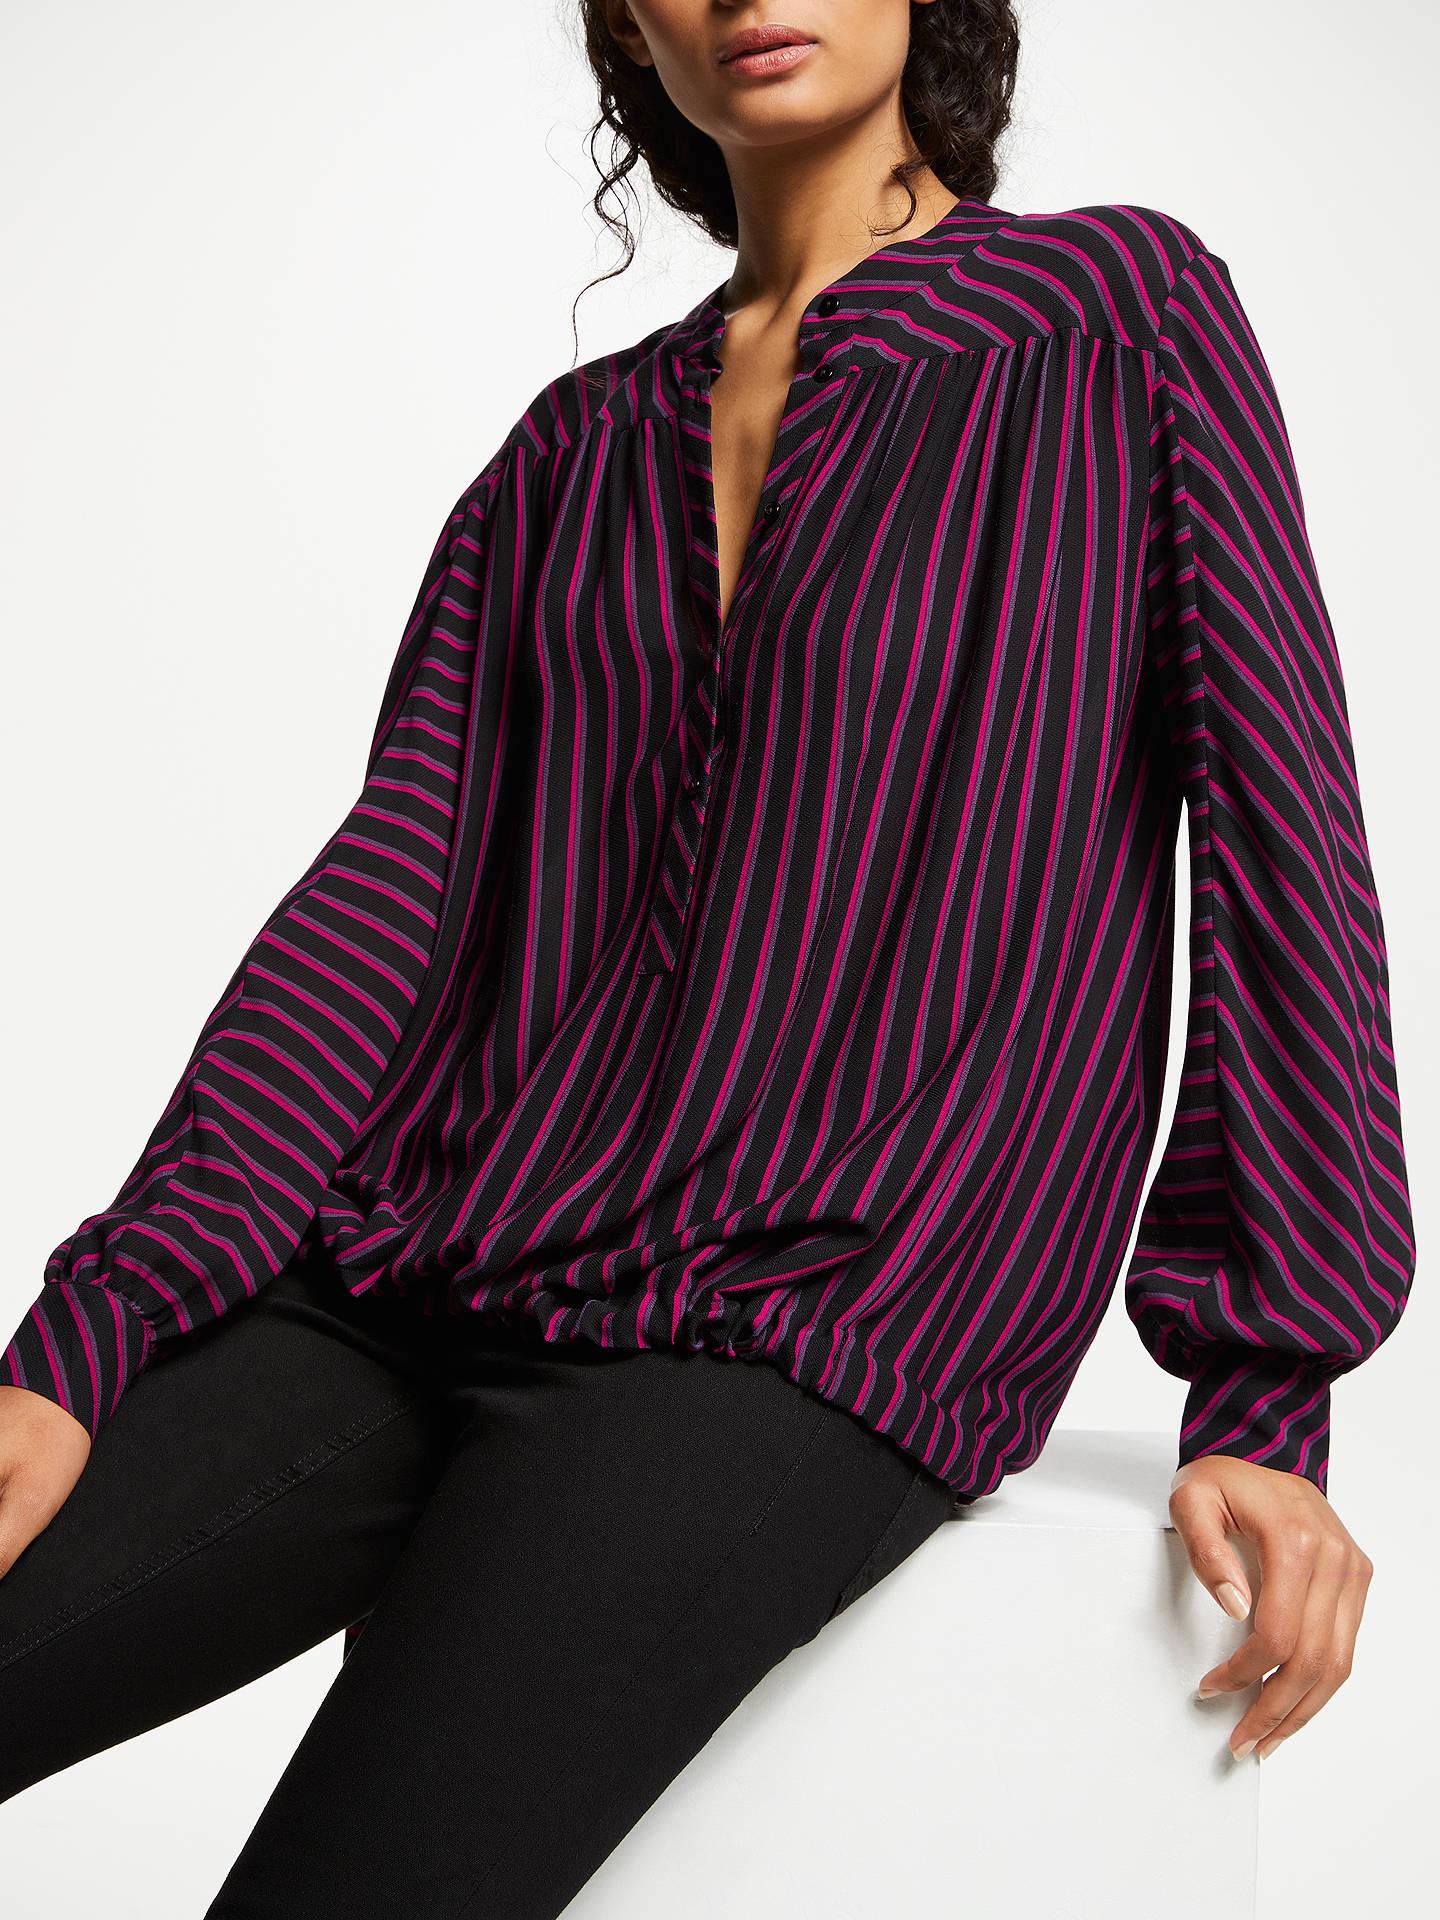 John Lewis & Partners AndOr Rosetta Blouse black&pink stripe £59